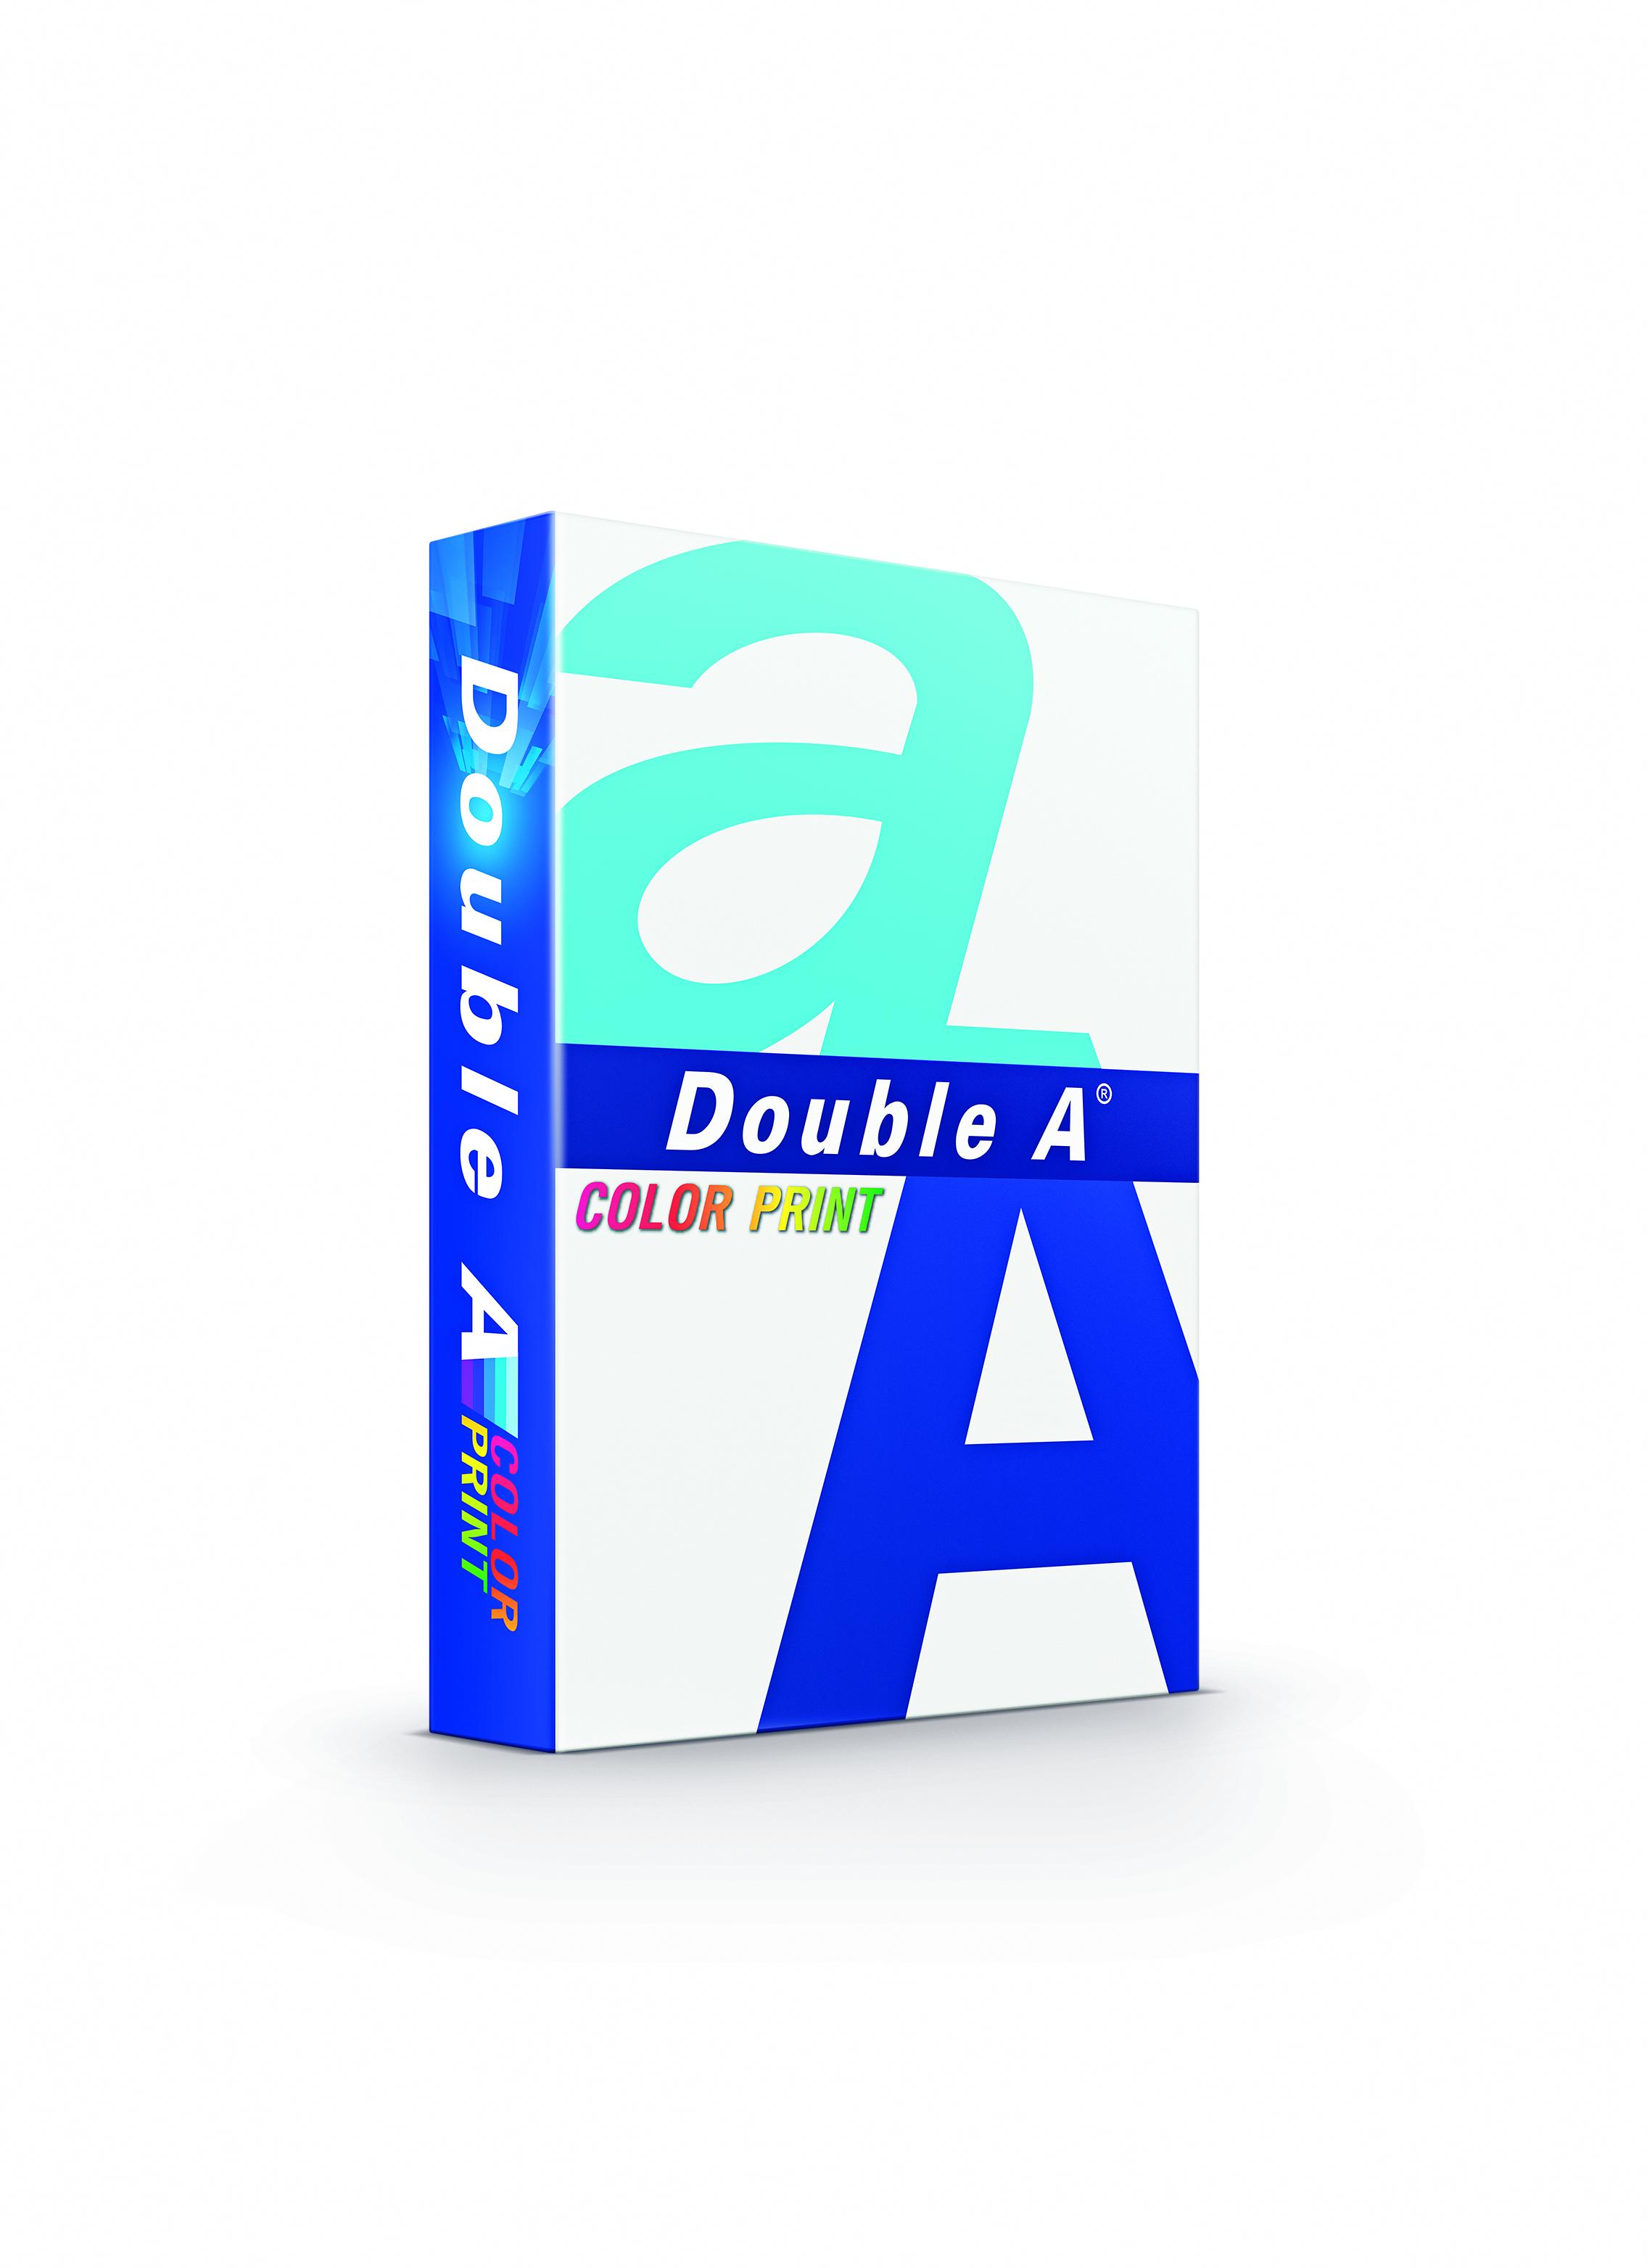 Double A Color Print Papier 90g/m² DIN-A3 weiß 500 Blatt